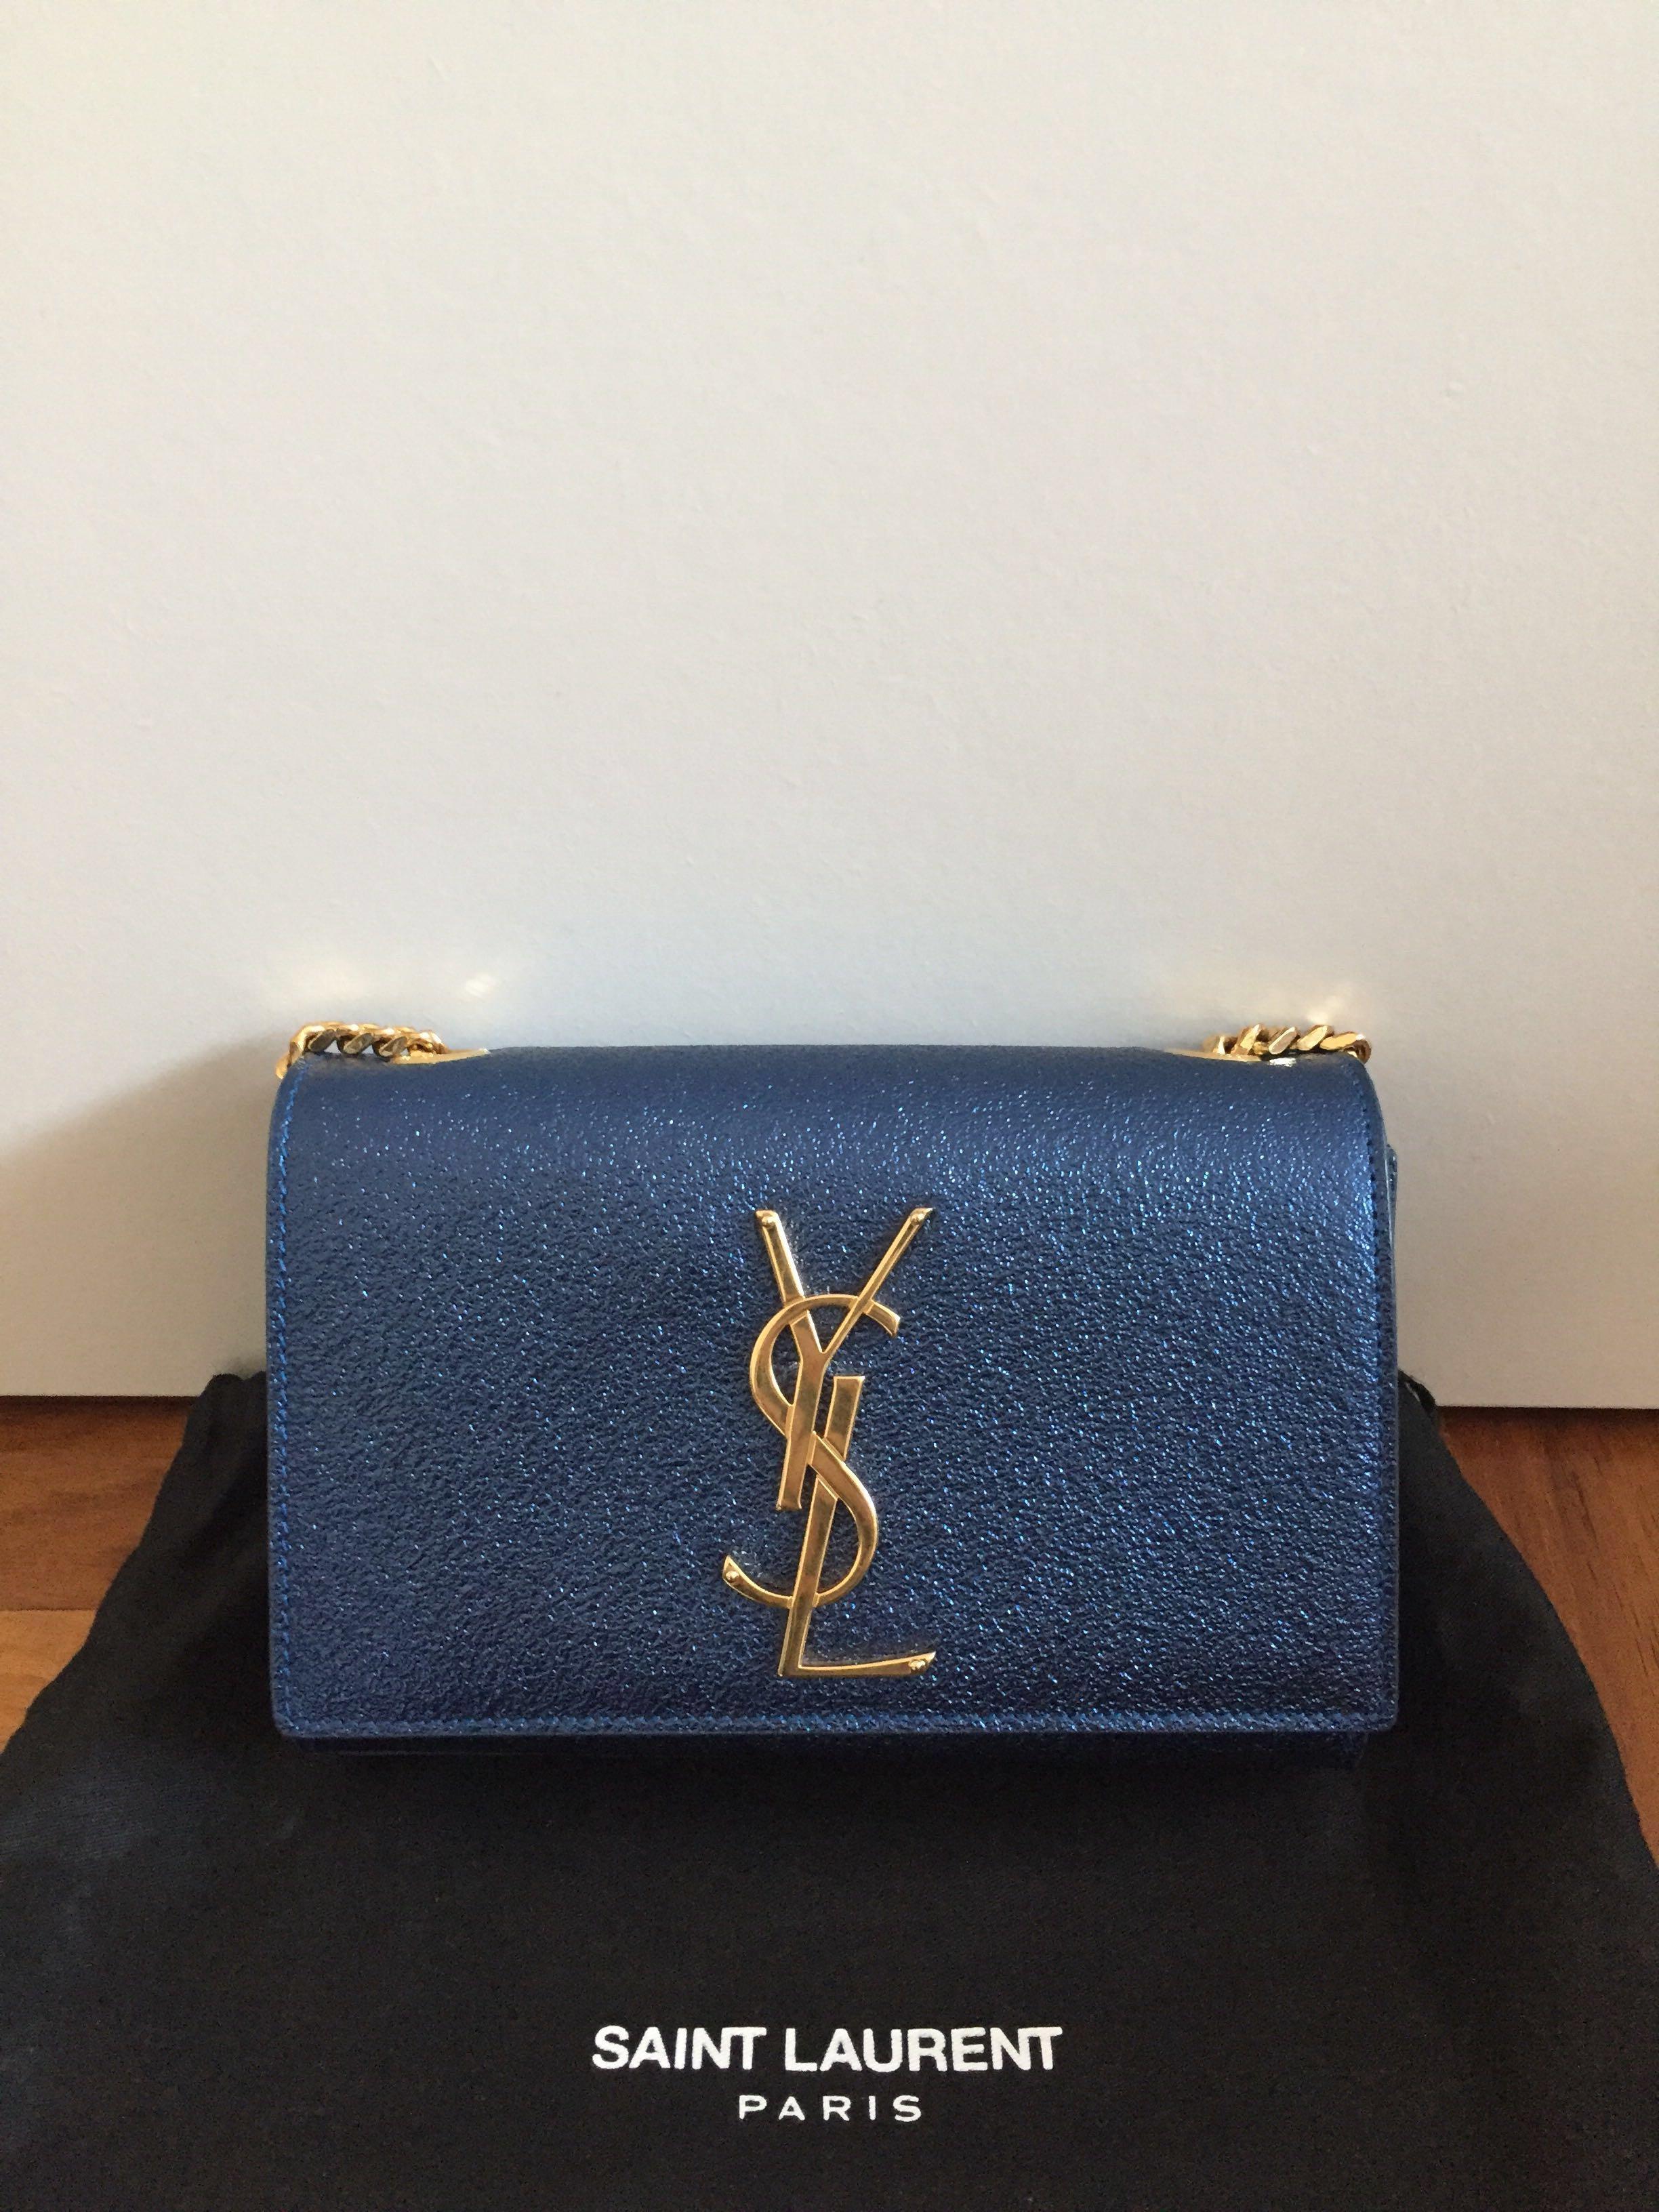 8a2109c59ce Authentic Saint Laurent YSL kate monogram crossbody chain bag - Metallic  blue, Luxury, Bags & Wallets, Handbags on Carousell